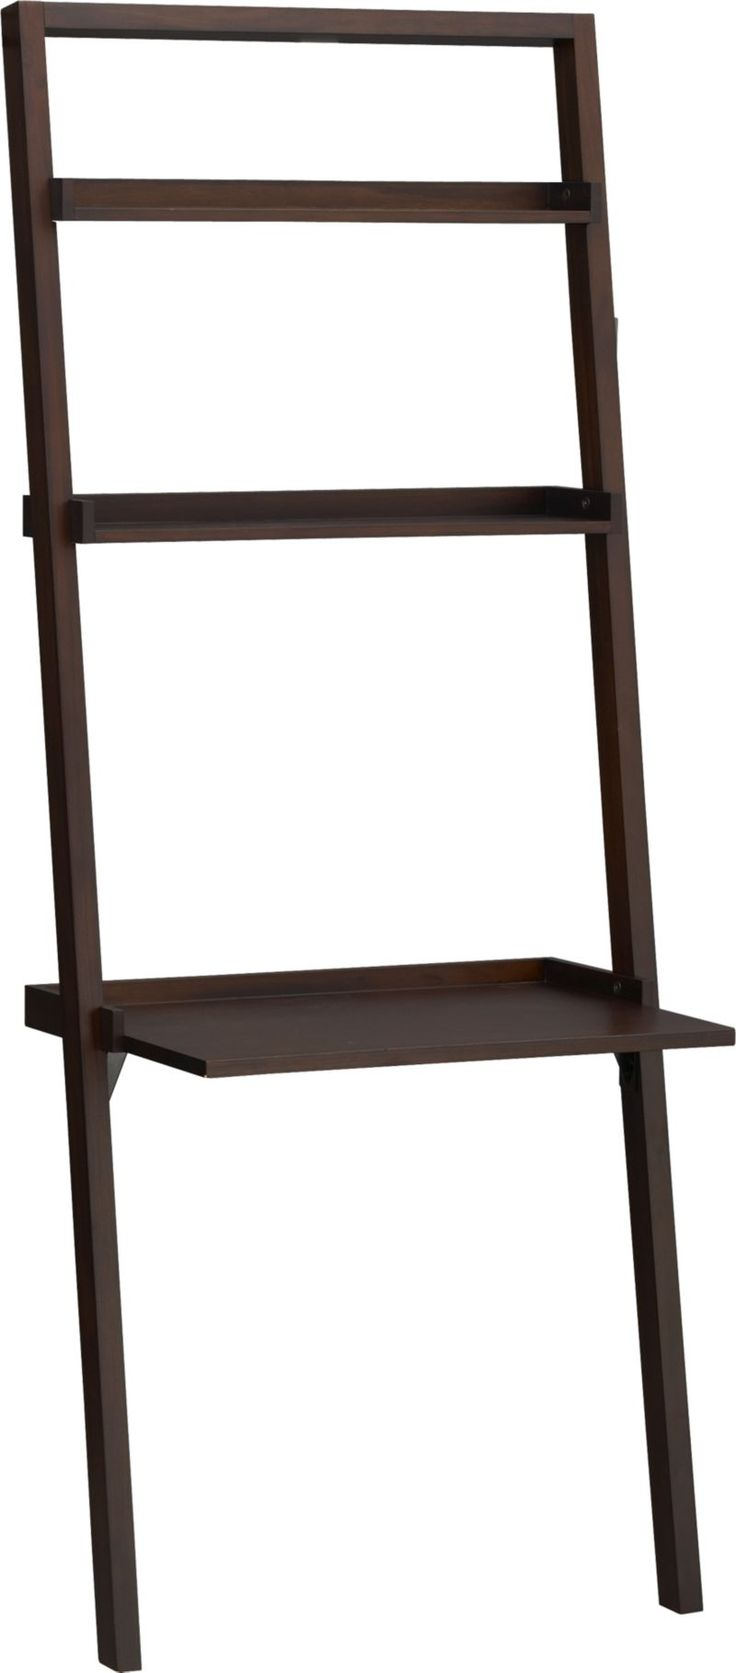 Sloane Java Leaning Desk  | Crate and Barrel